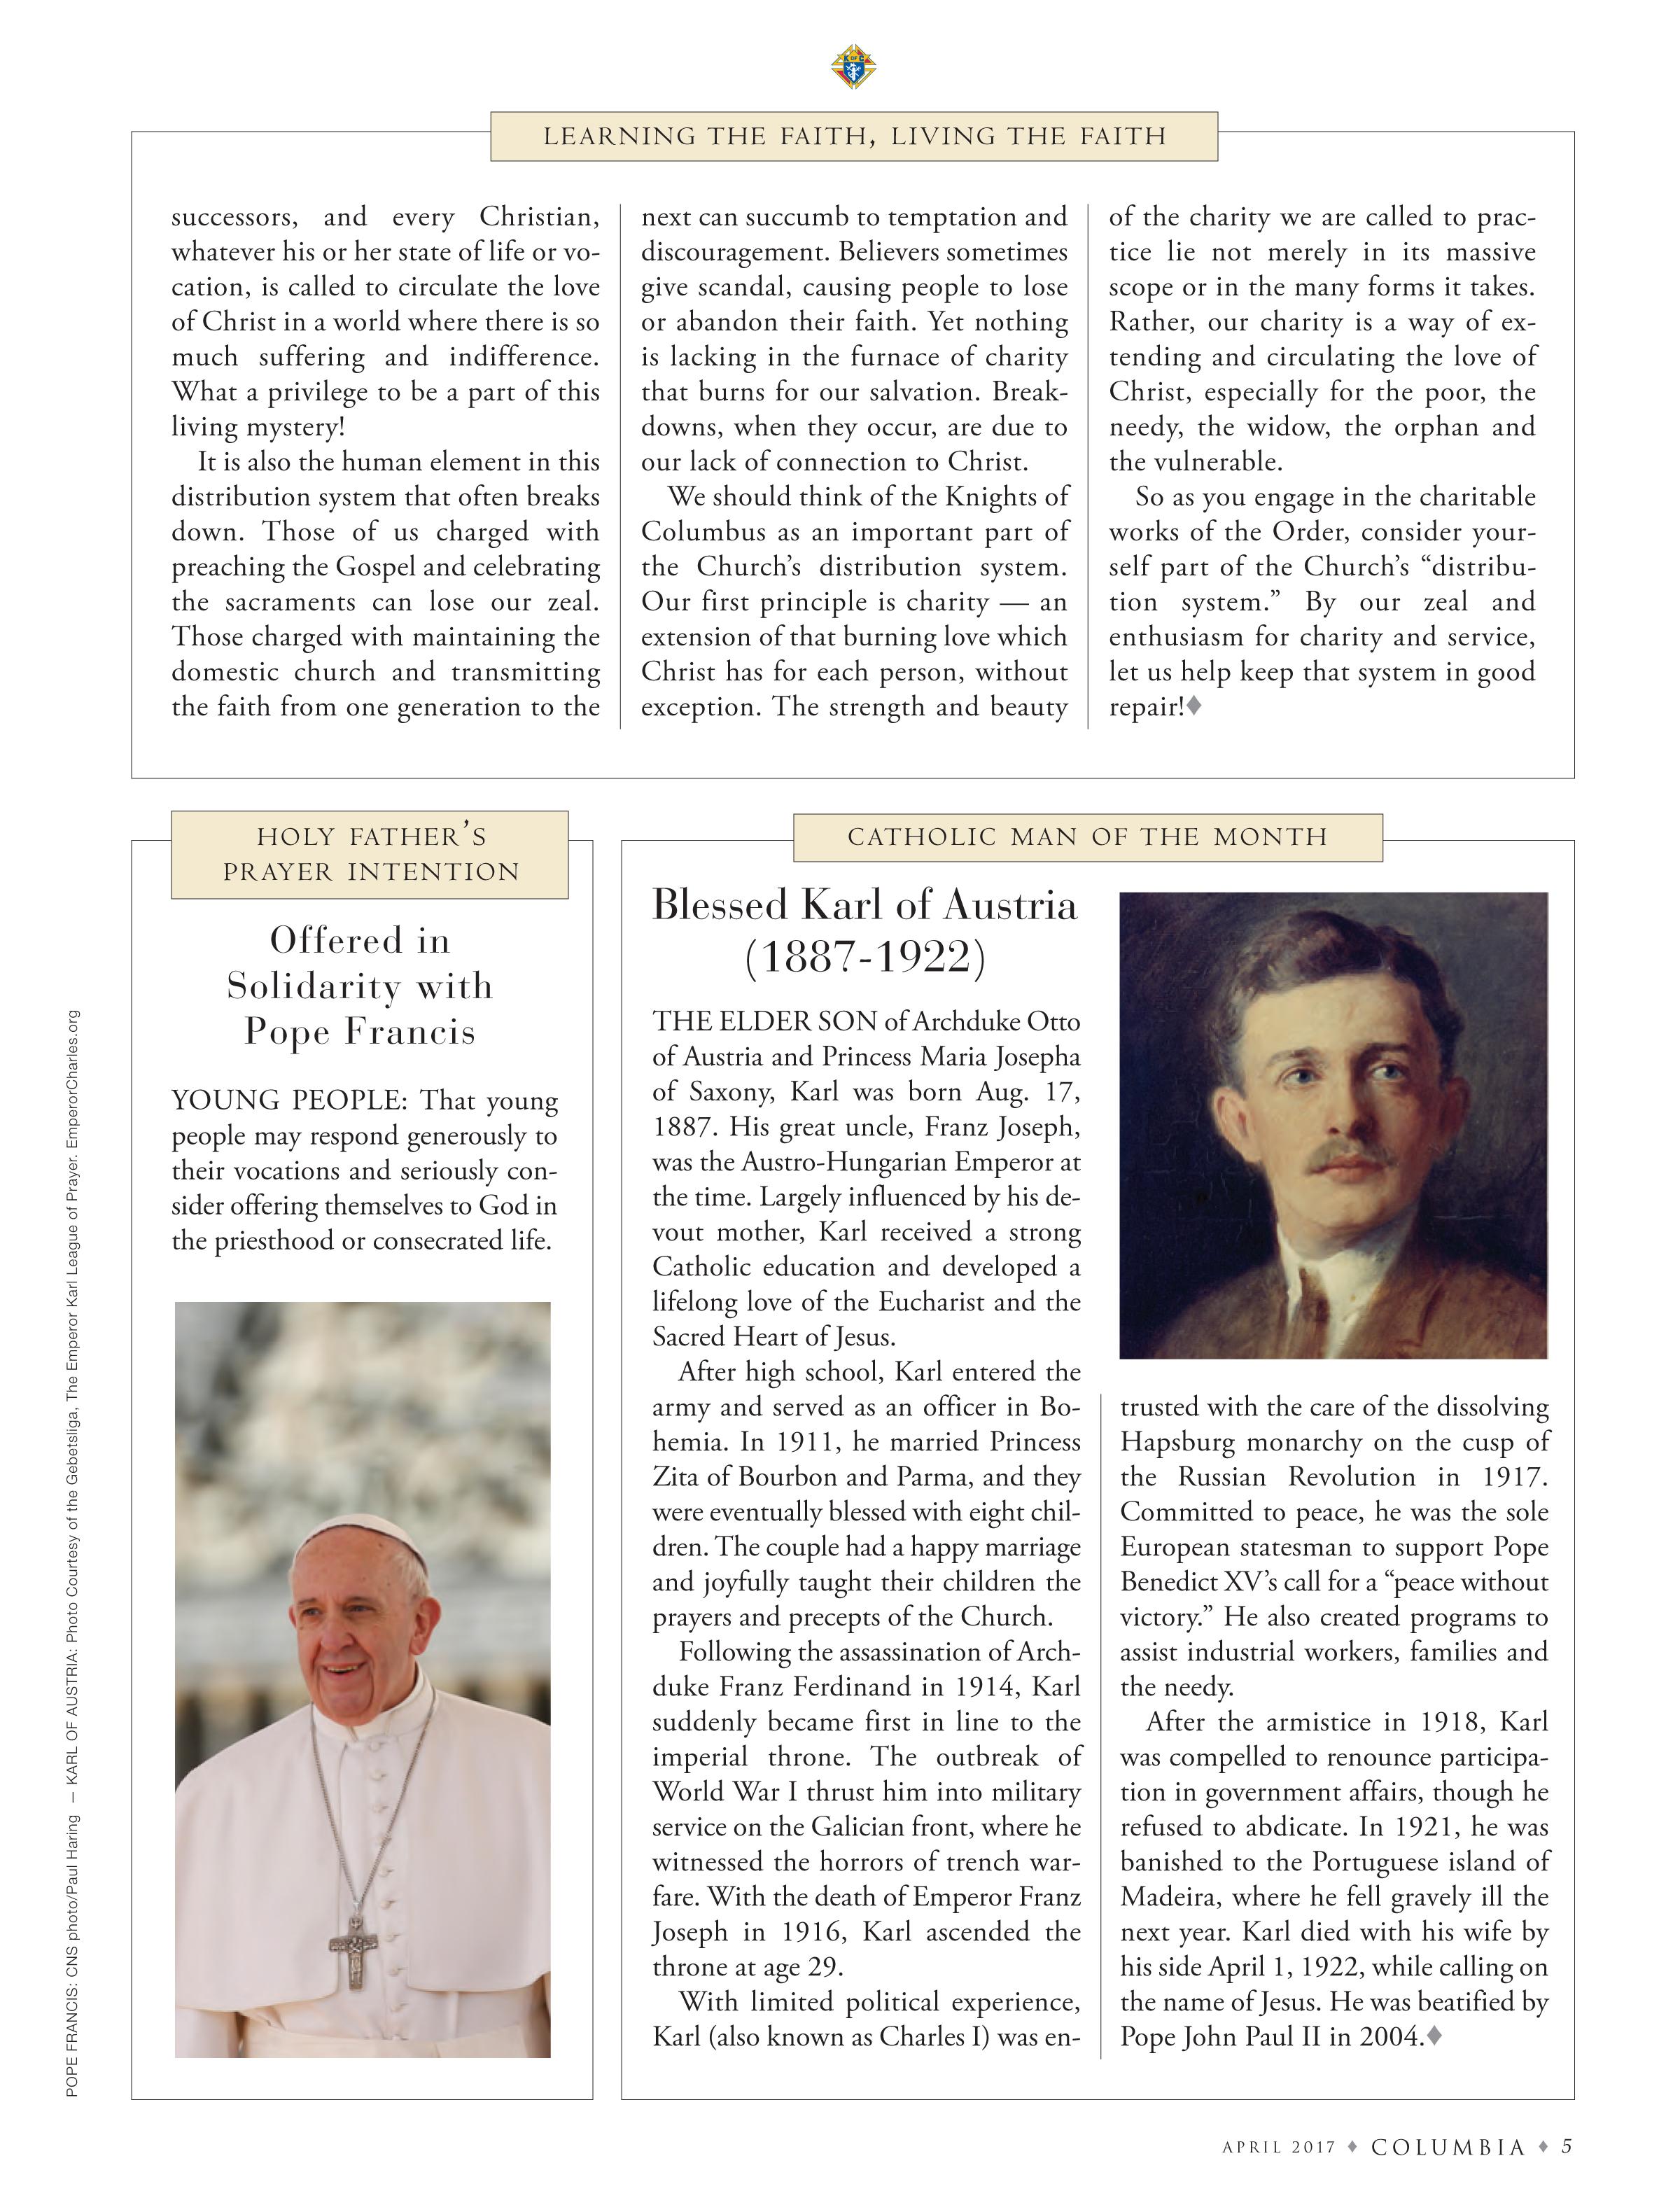 Catholic Man of the Month April 2017 Columbia.jpg